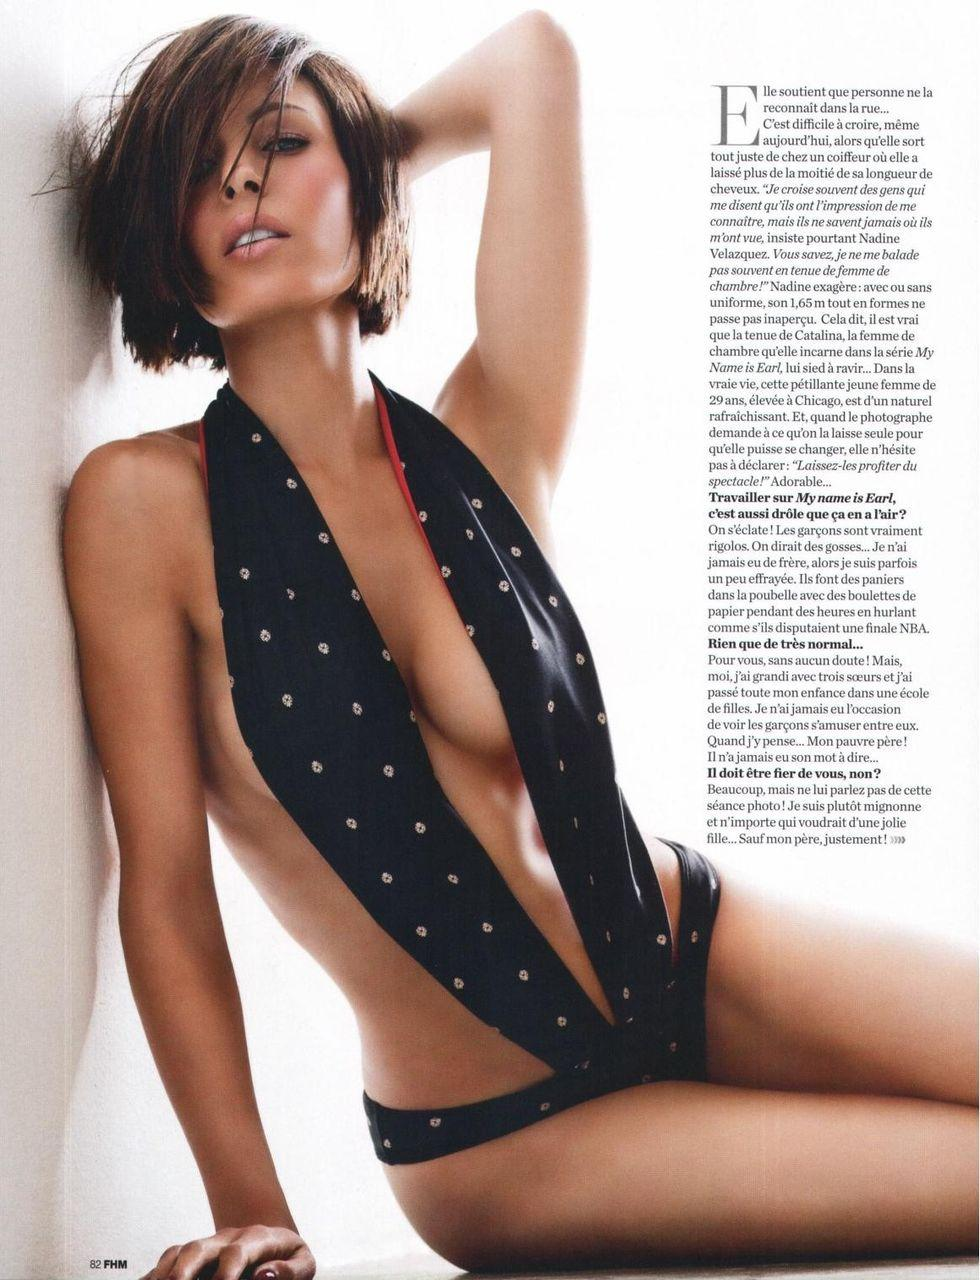 desnuda Nadine Velazquez 1